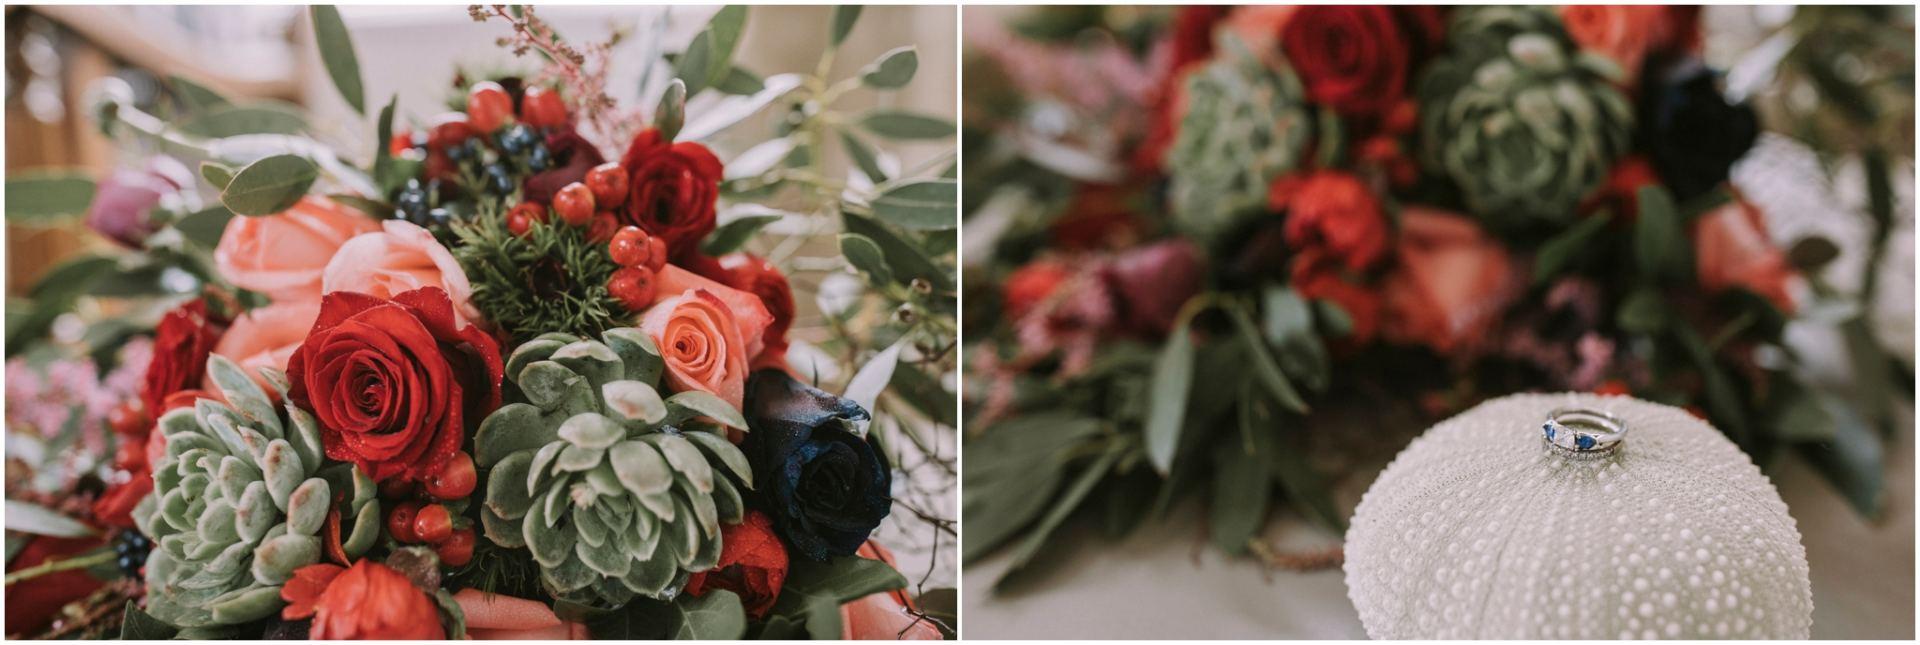 The catlins wedding flowers